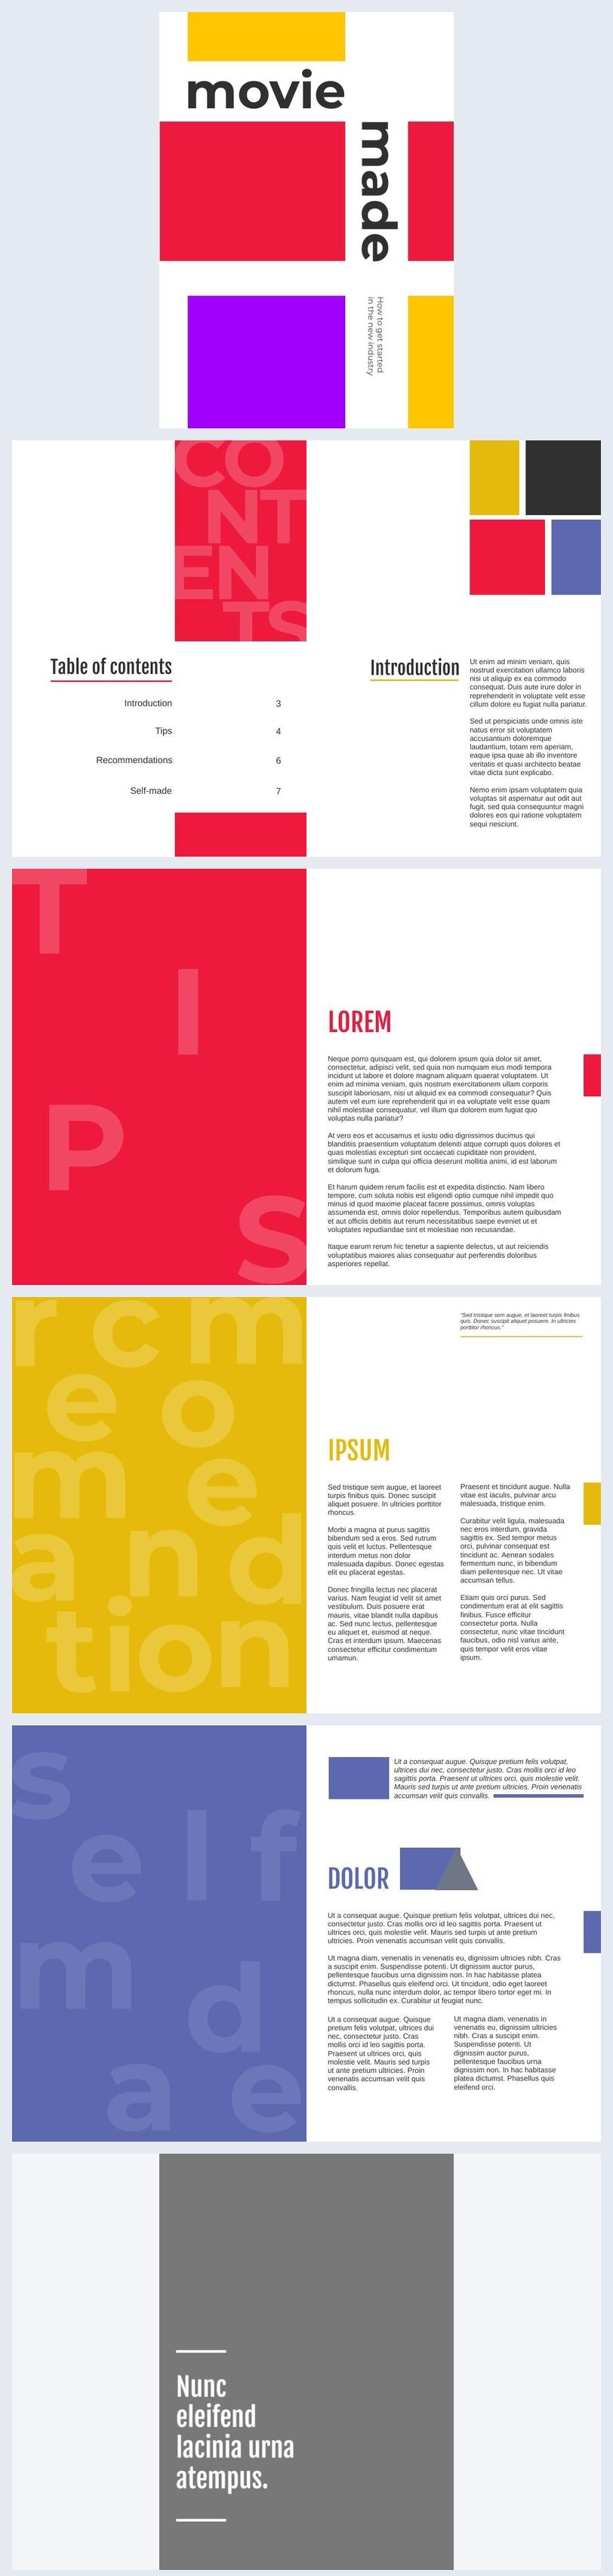 Design de Revista Colorida